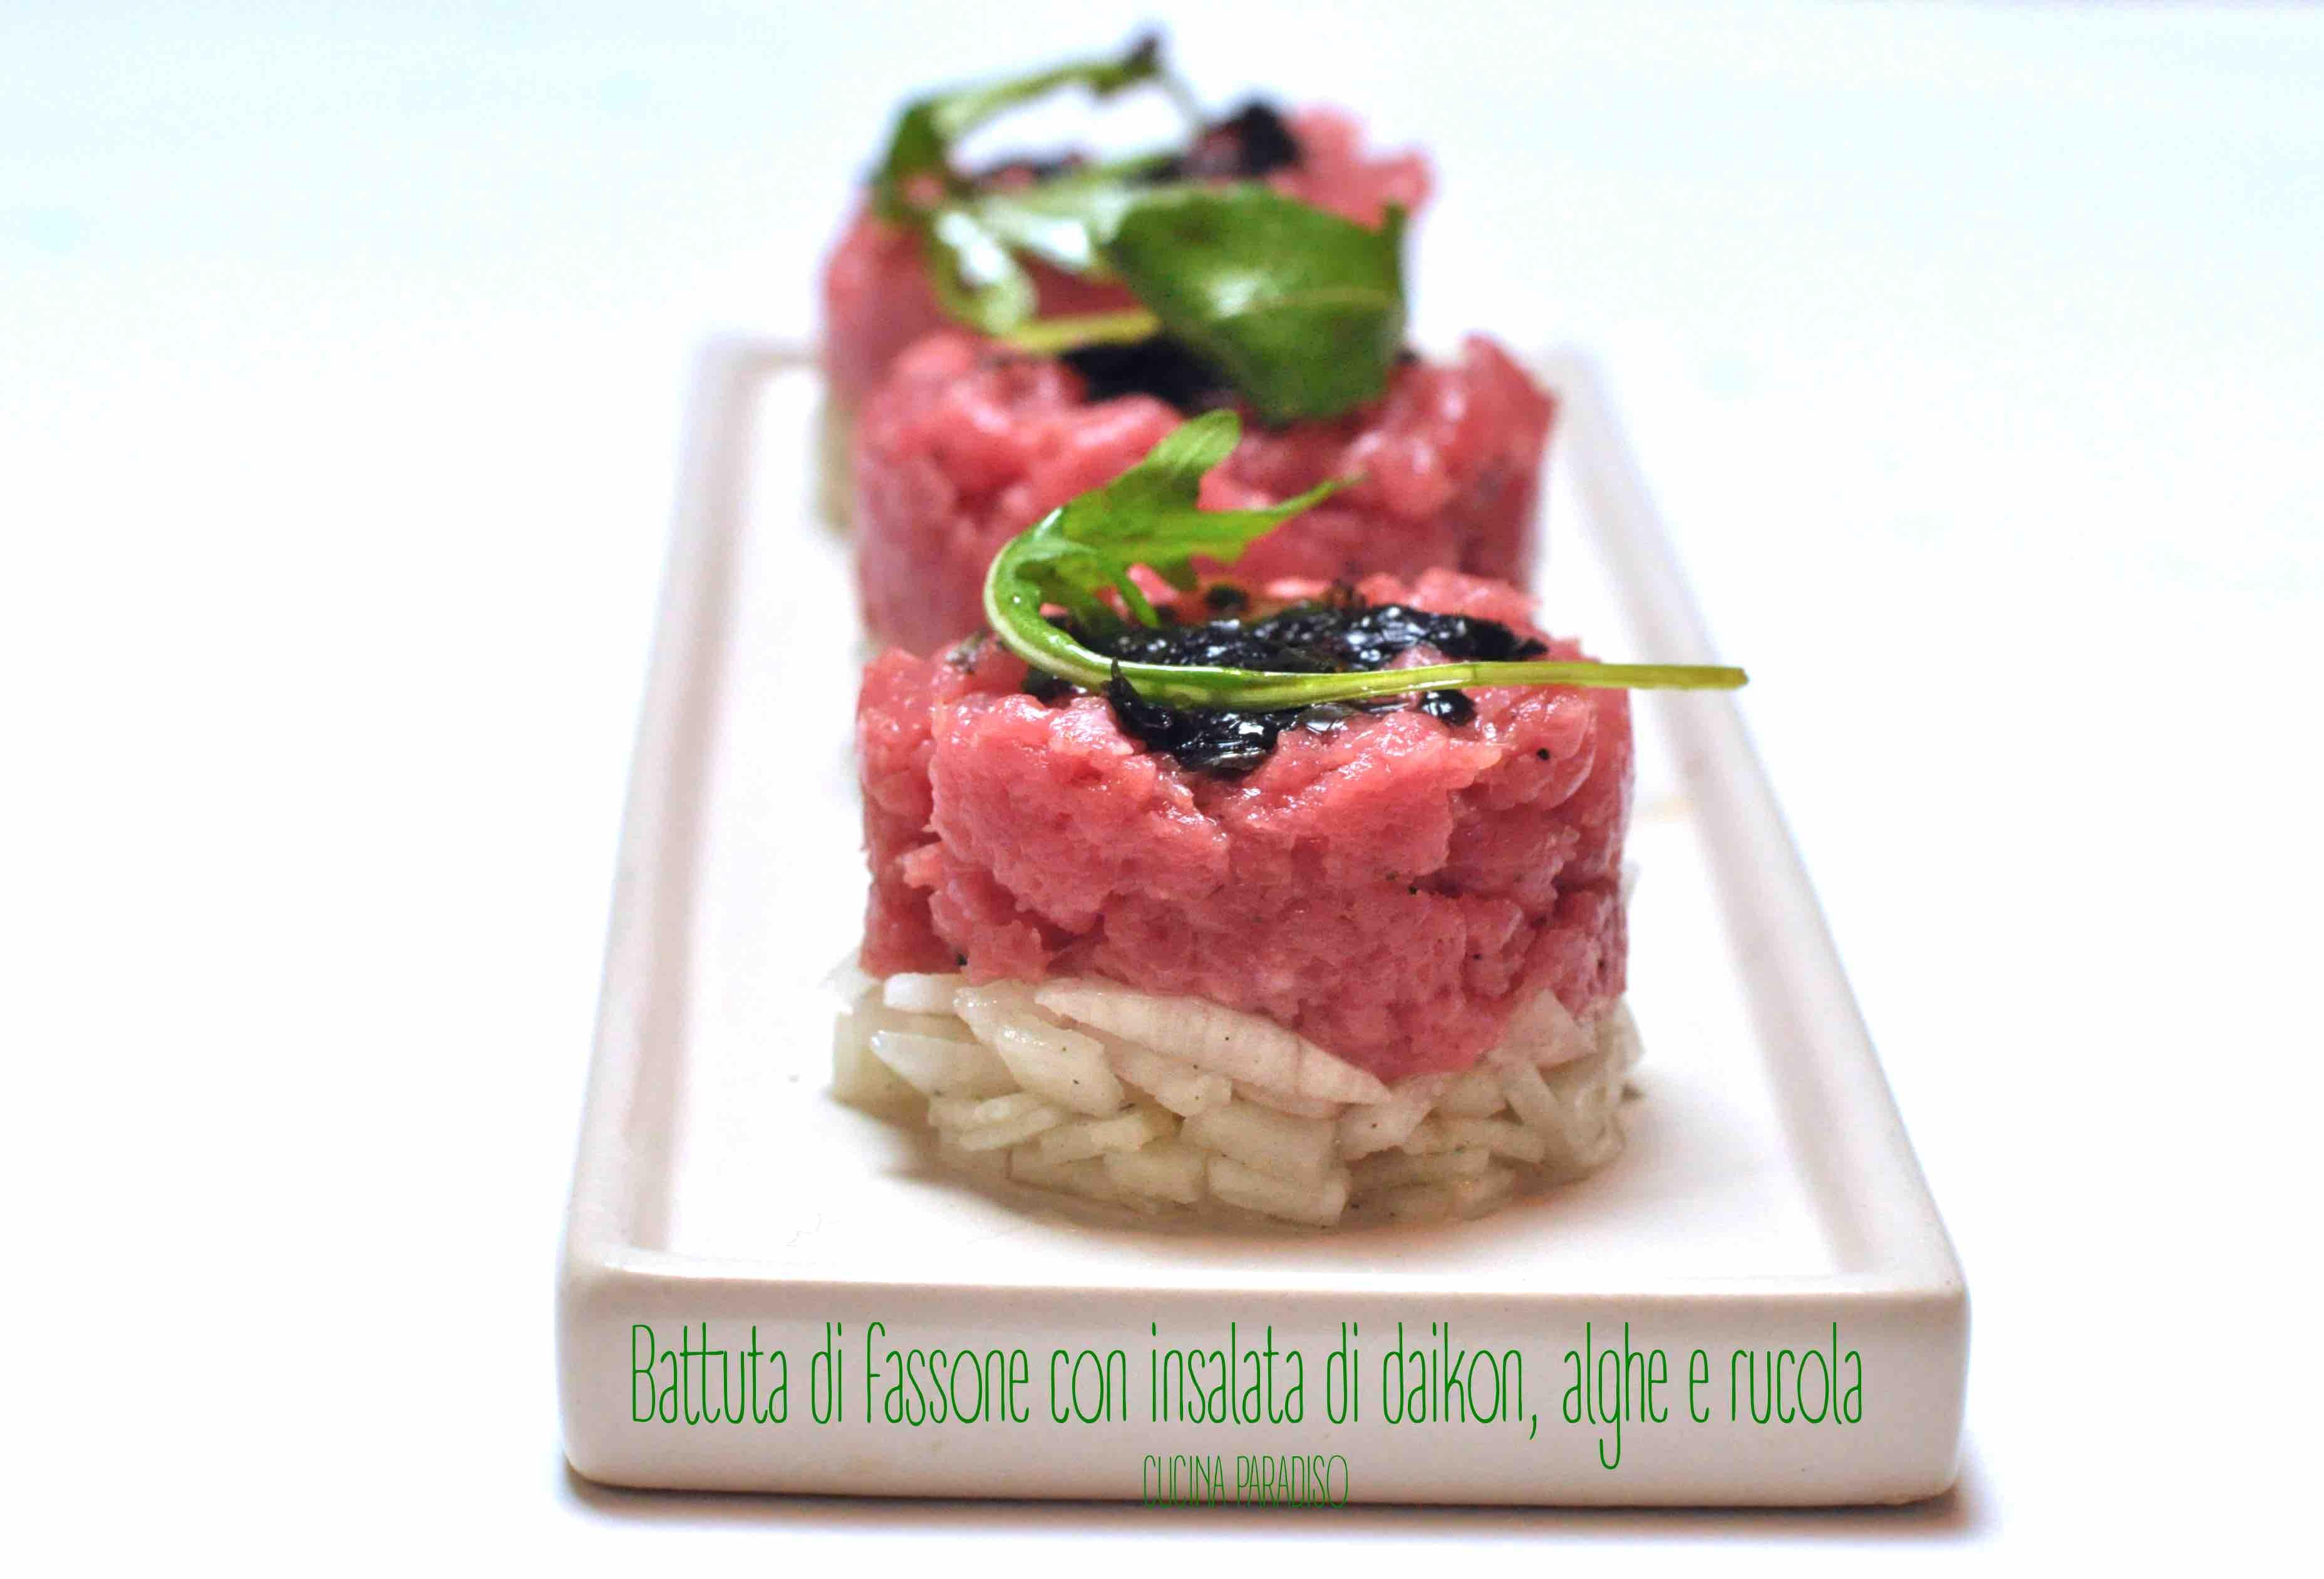 Battuta di fassone con insalata di daikon, alghe e rucola2